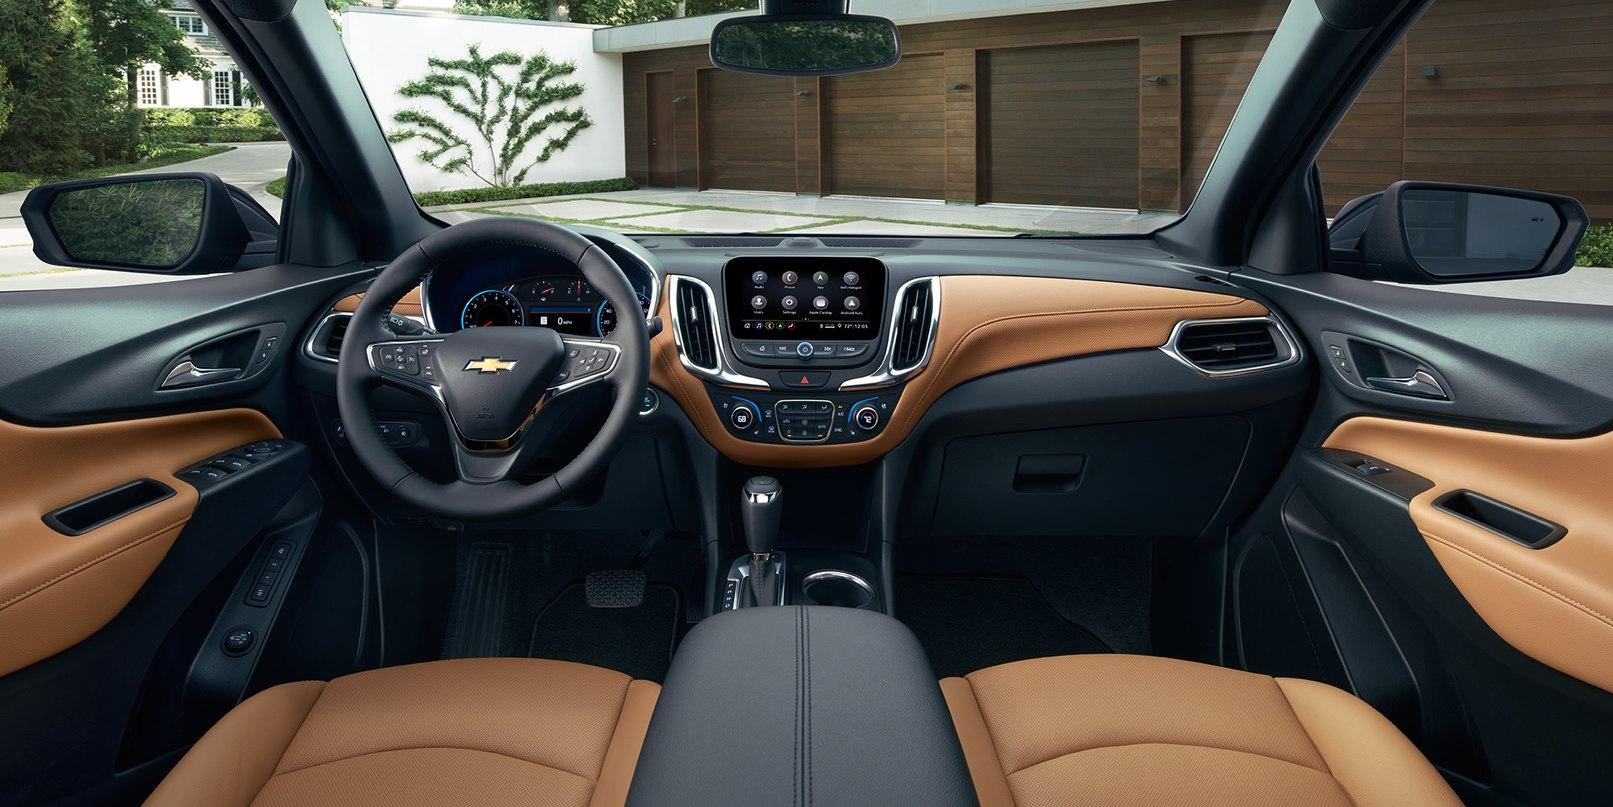 Interior of the 2019 Chevrolet Equionx